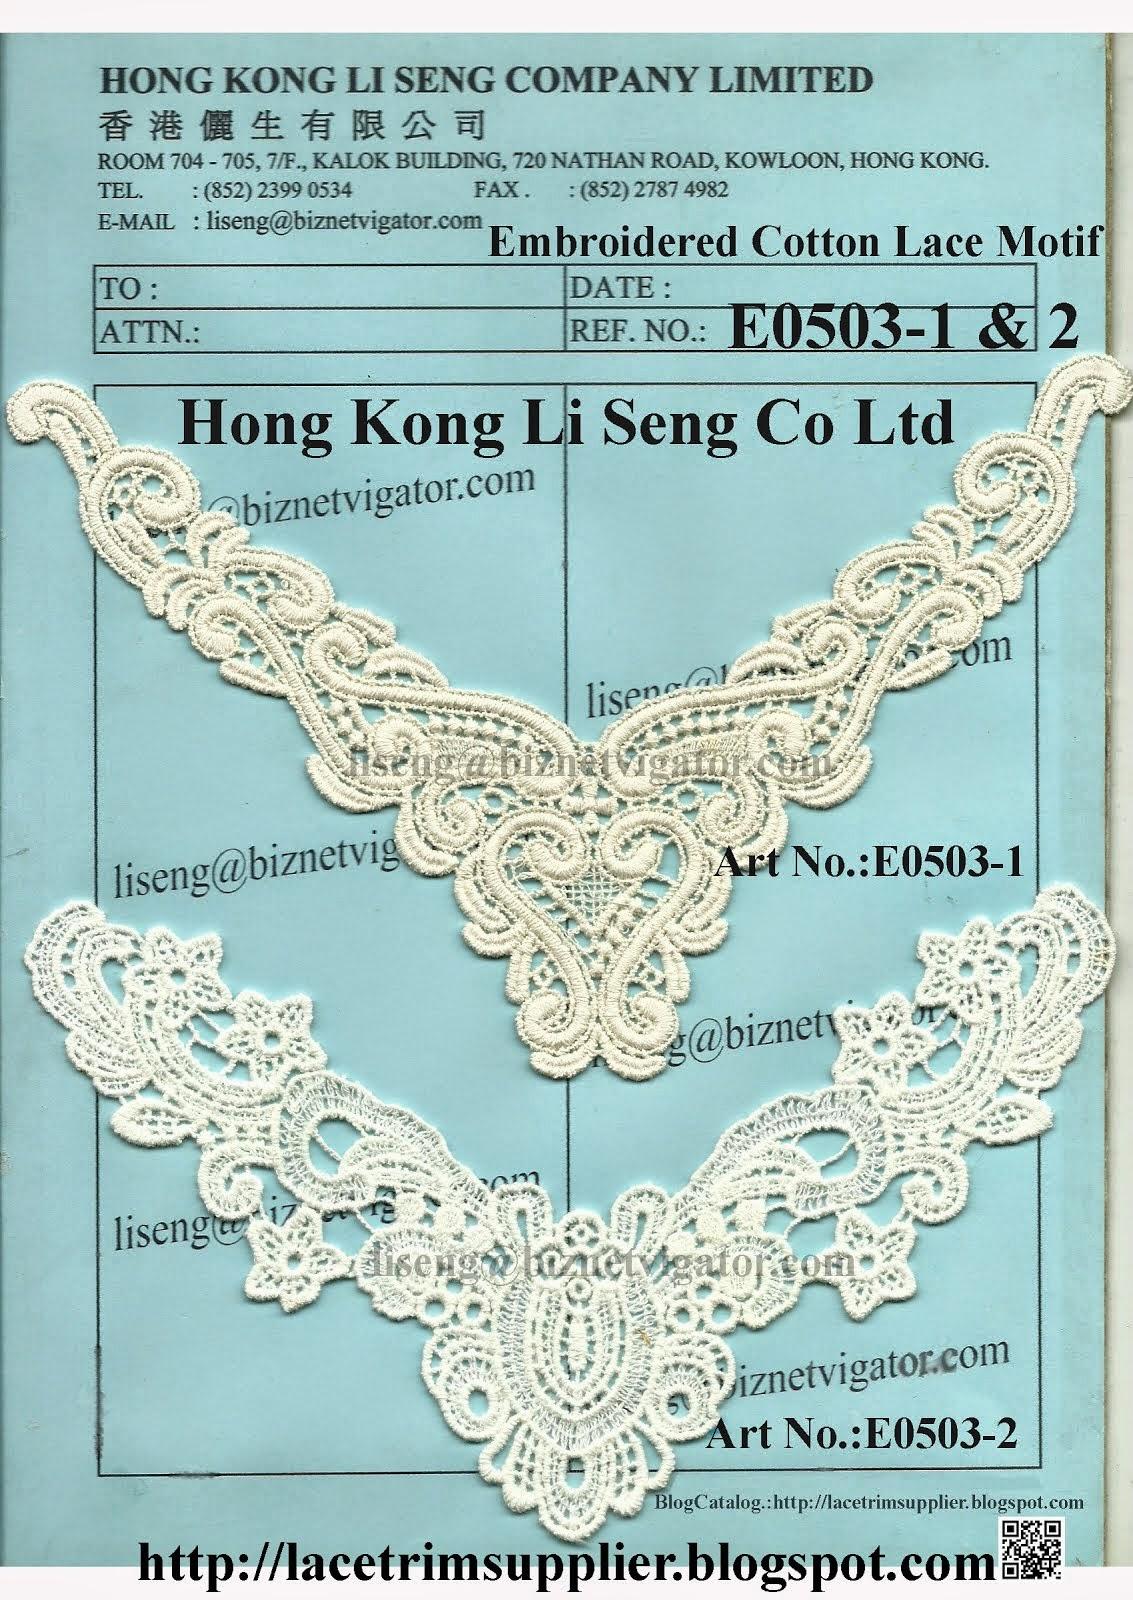 Embroidered Cotton Lace Motif Manufacturer and Supplier - Hong Kong Li Seng Co Ltd